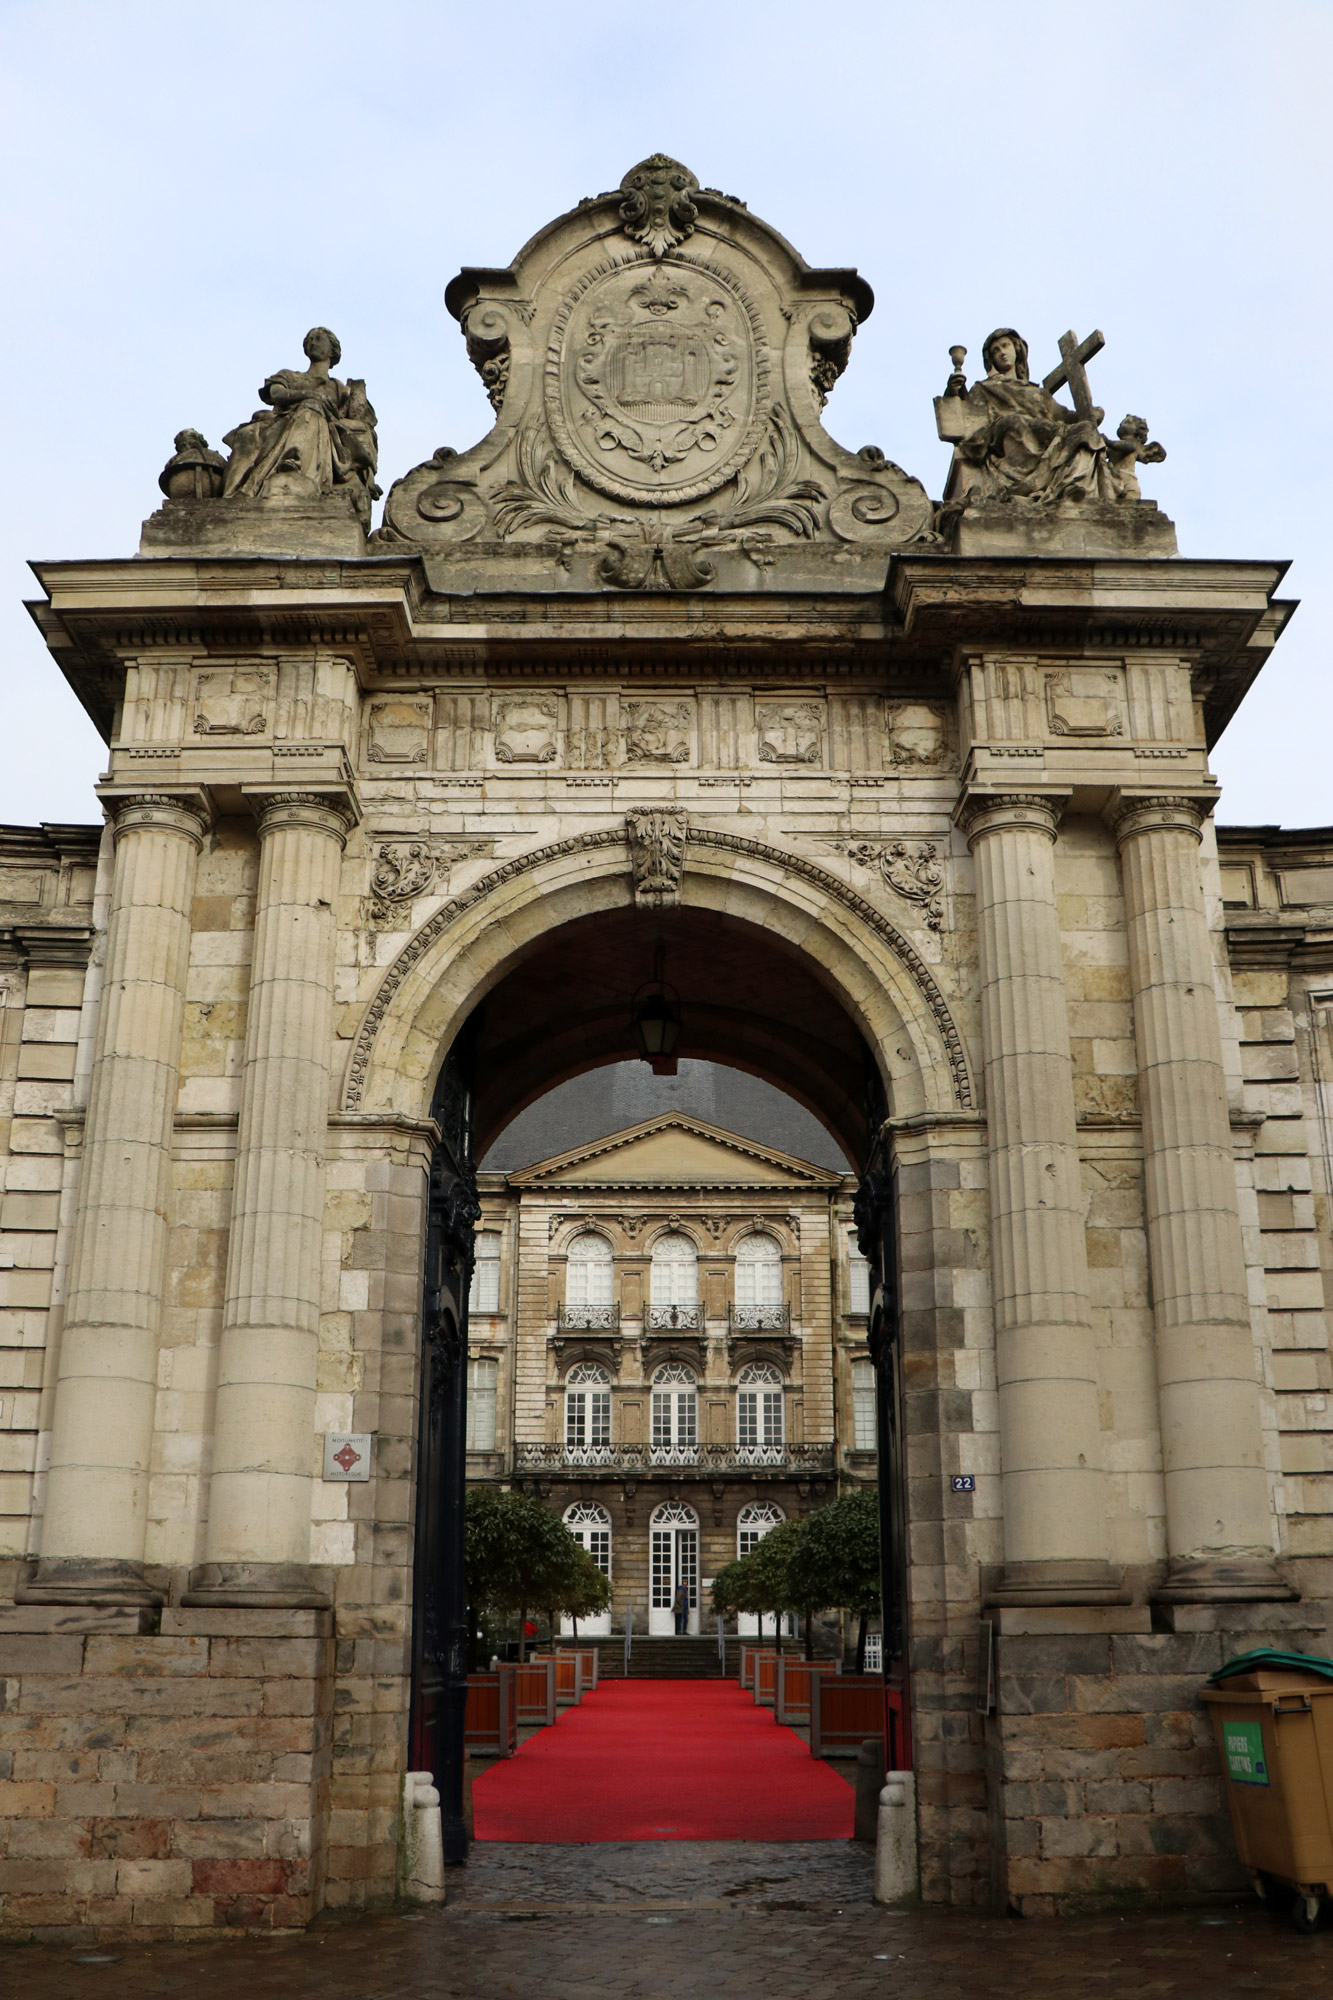 Stedentrip Arras - Abdij van Sint Vaast